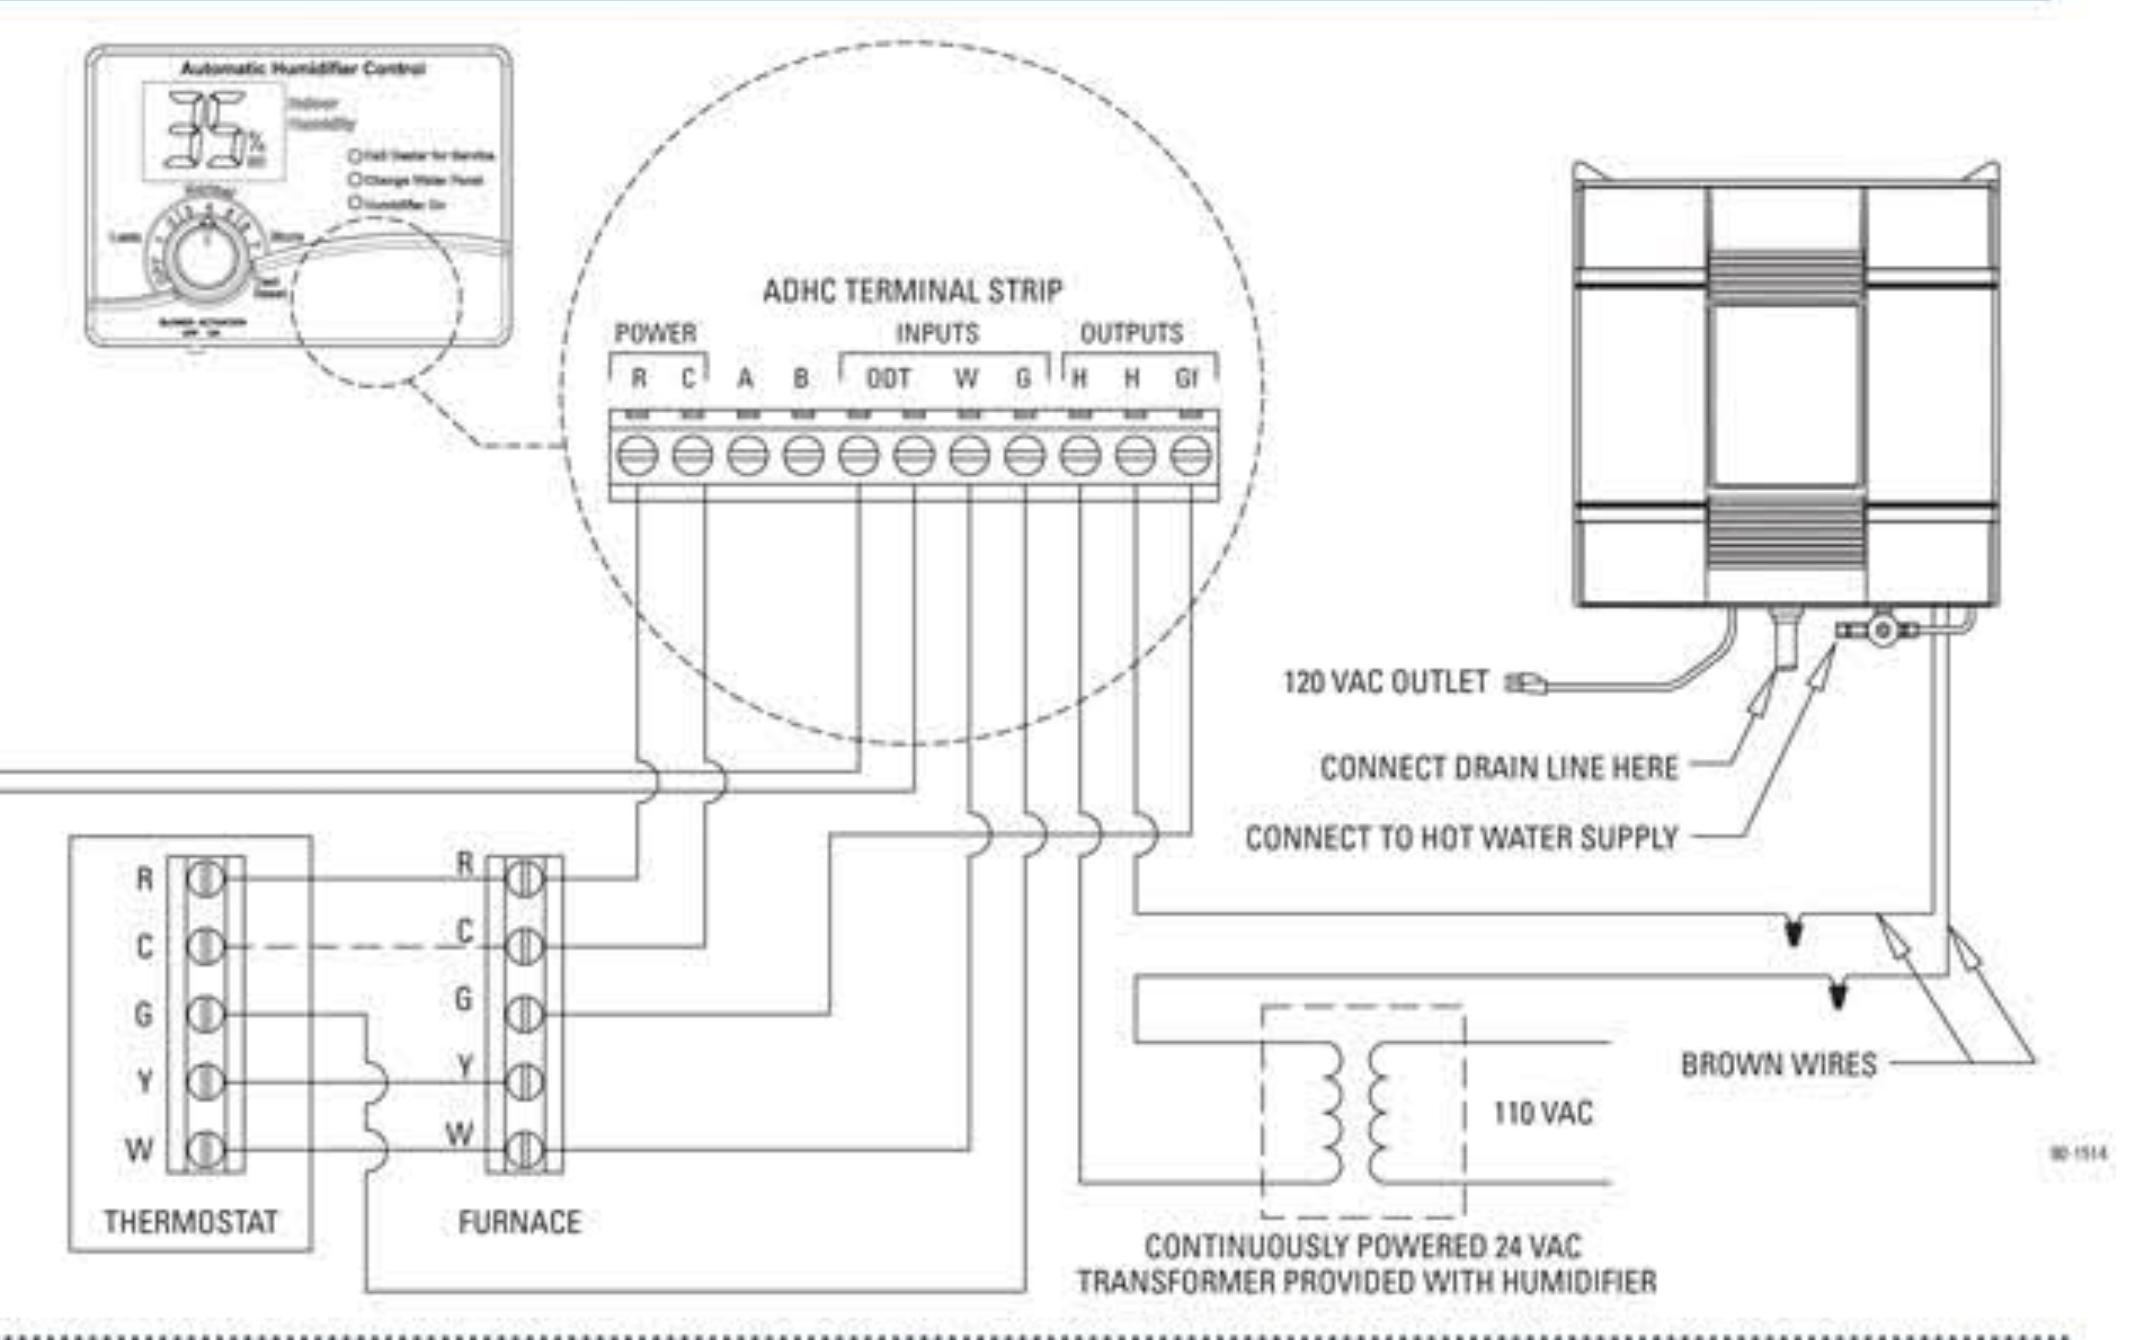 Astounding Aprilaire Thermostat Wiring Diagram Wiring Library Wiring Cloud Lukepaidewilluminateatxorg